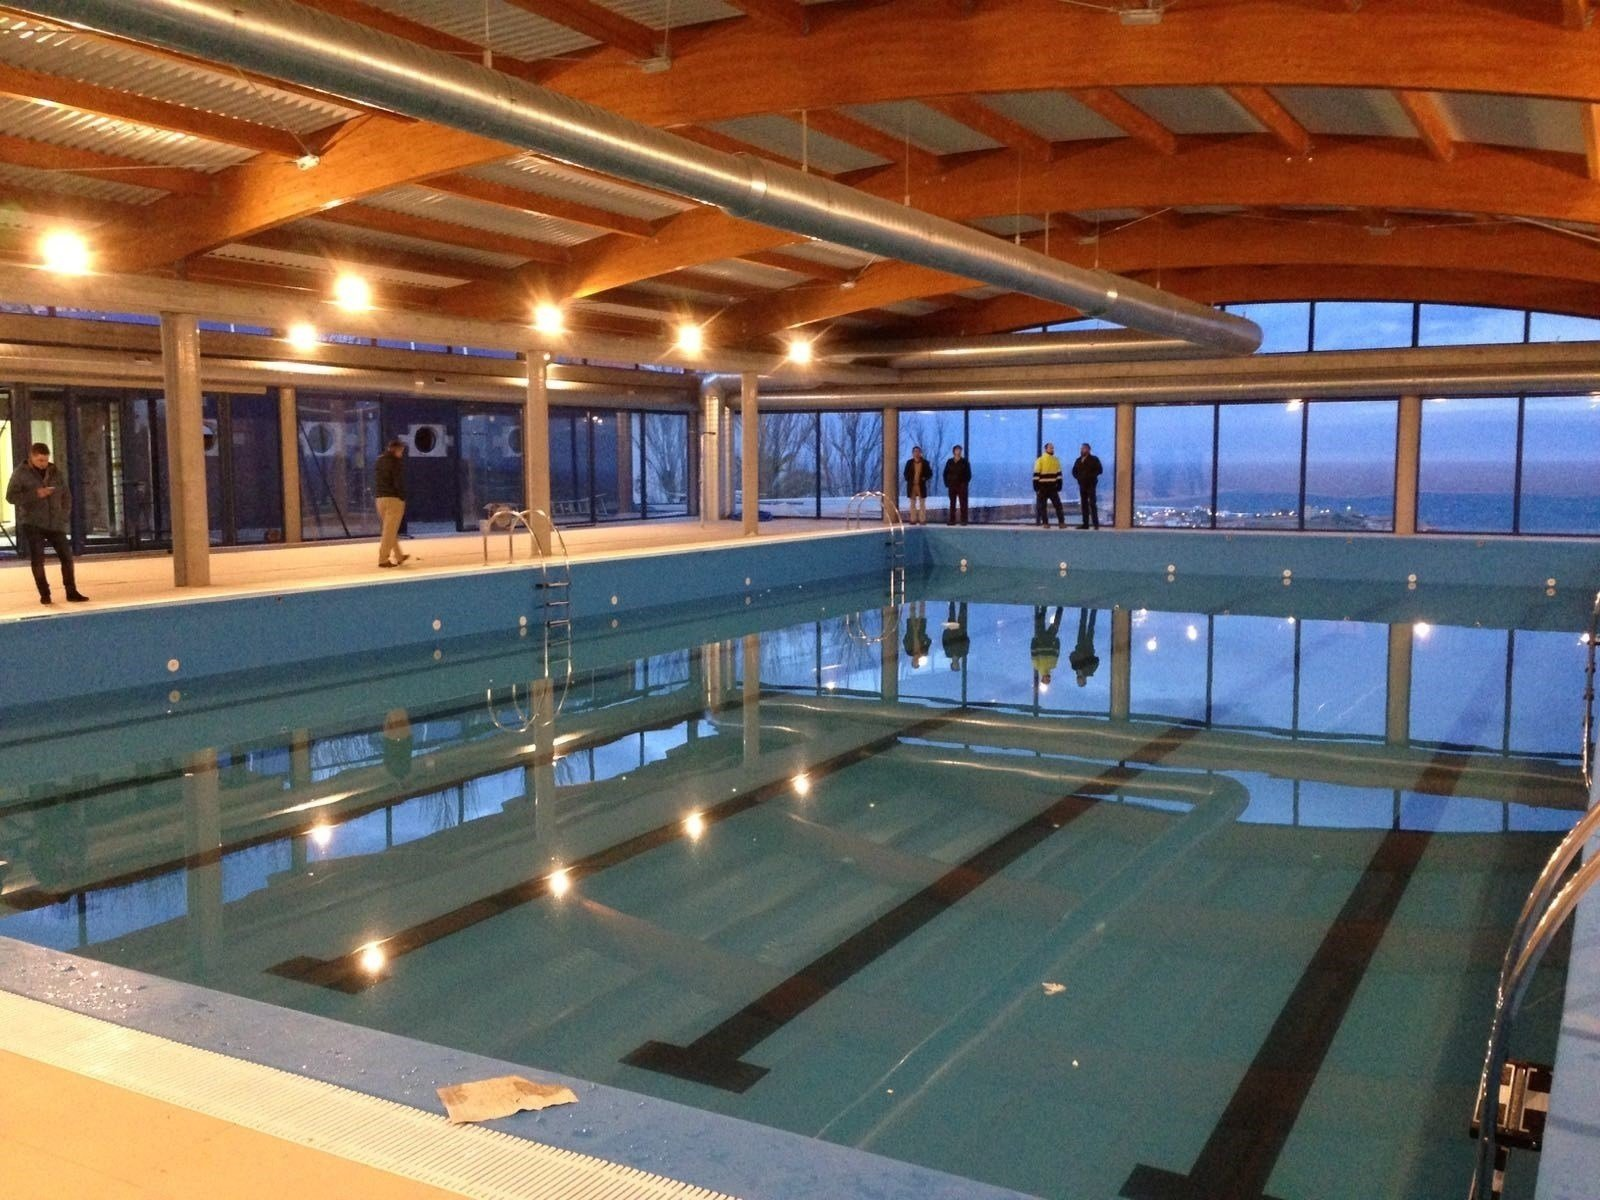 Concluida la piscina cubierta tras una inversi n de 700 for Piscina cubierta catarroja